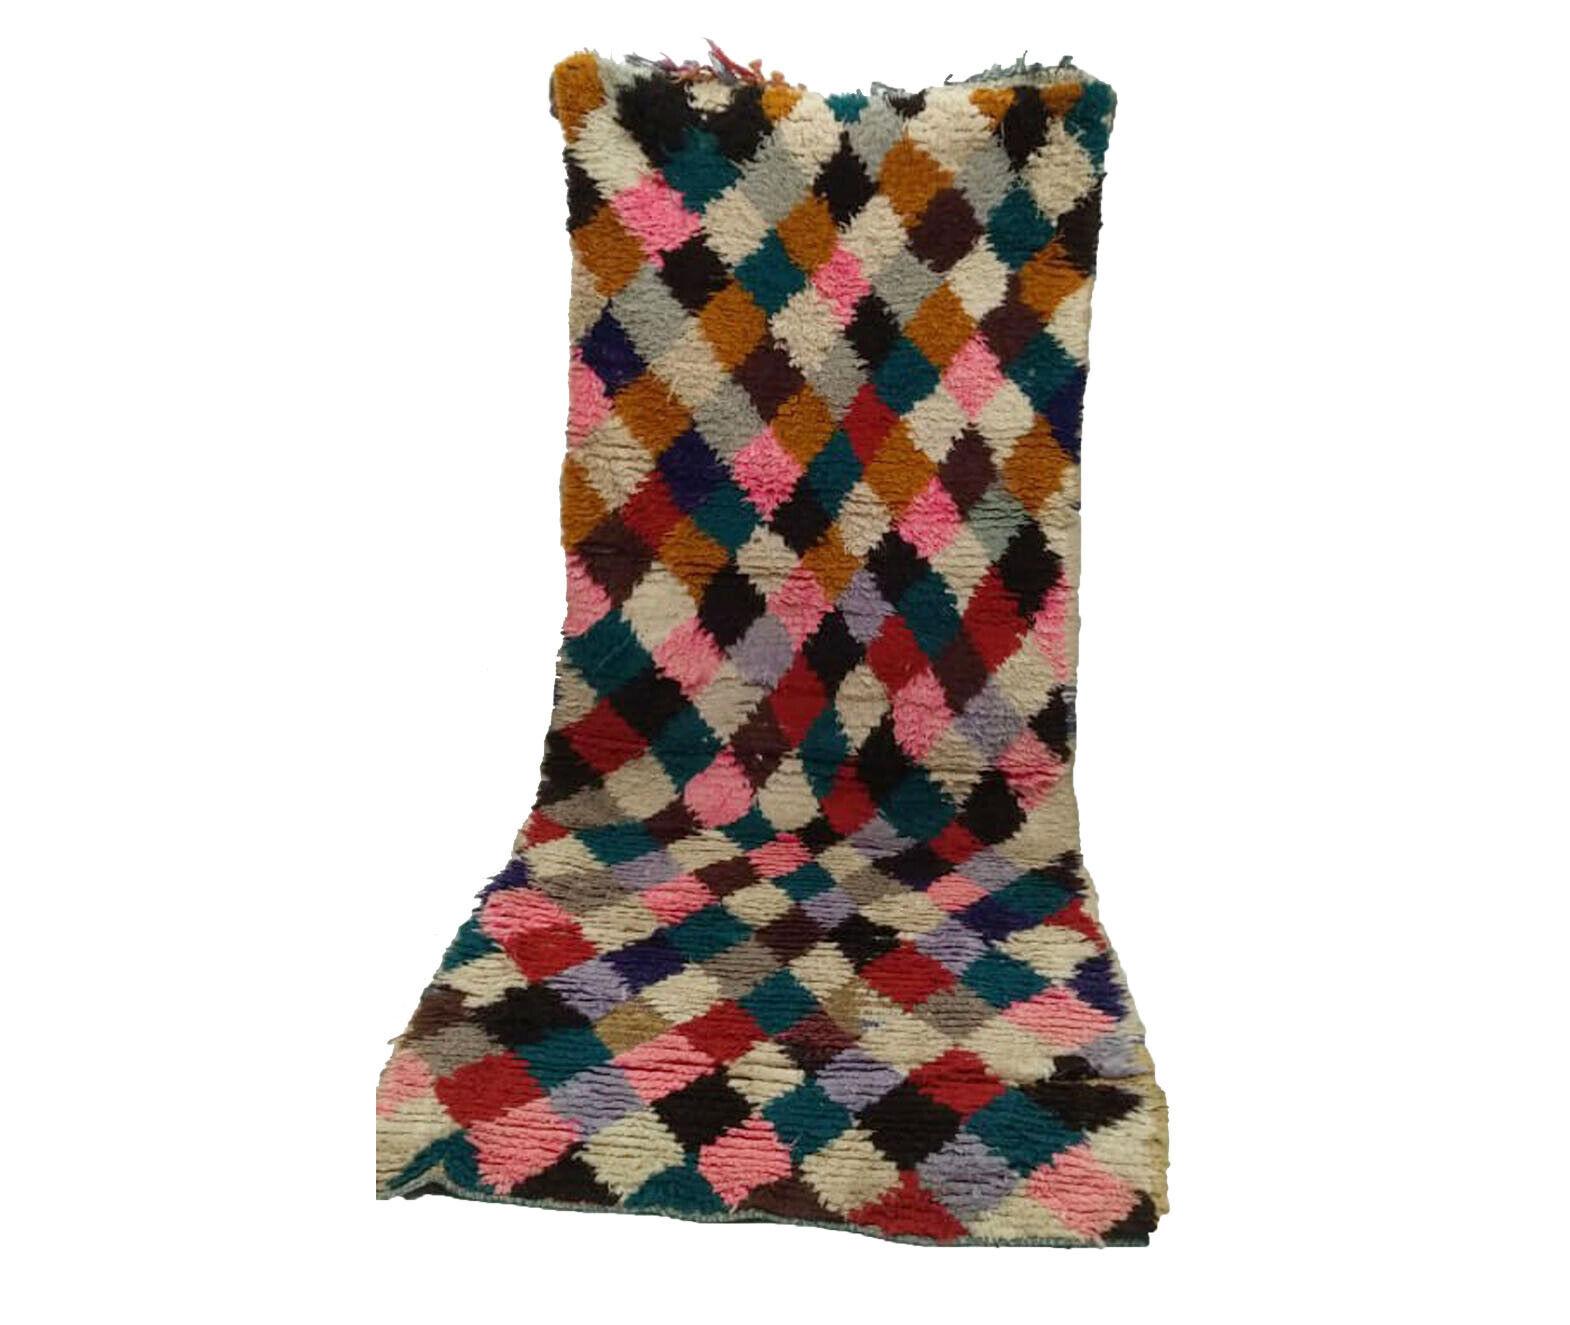 Boucherouite rug 3x7 ft. Moroccan Berber vintage rug Morocco azilal Handmade rug